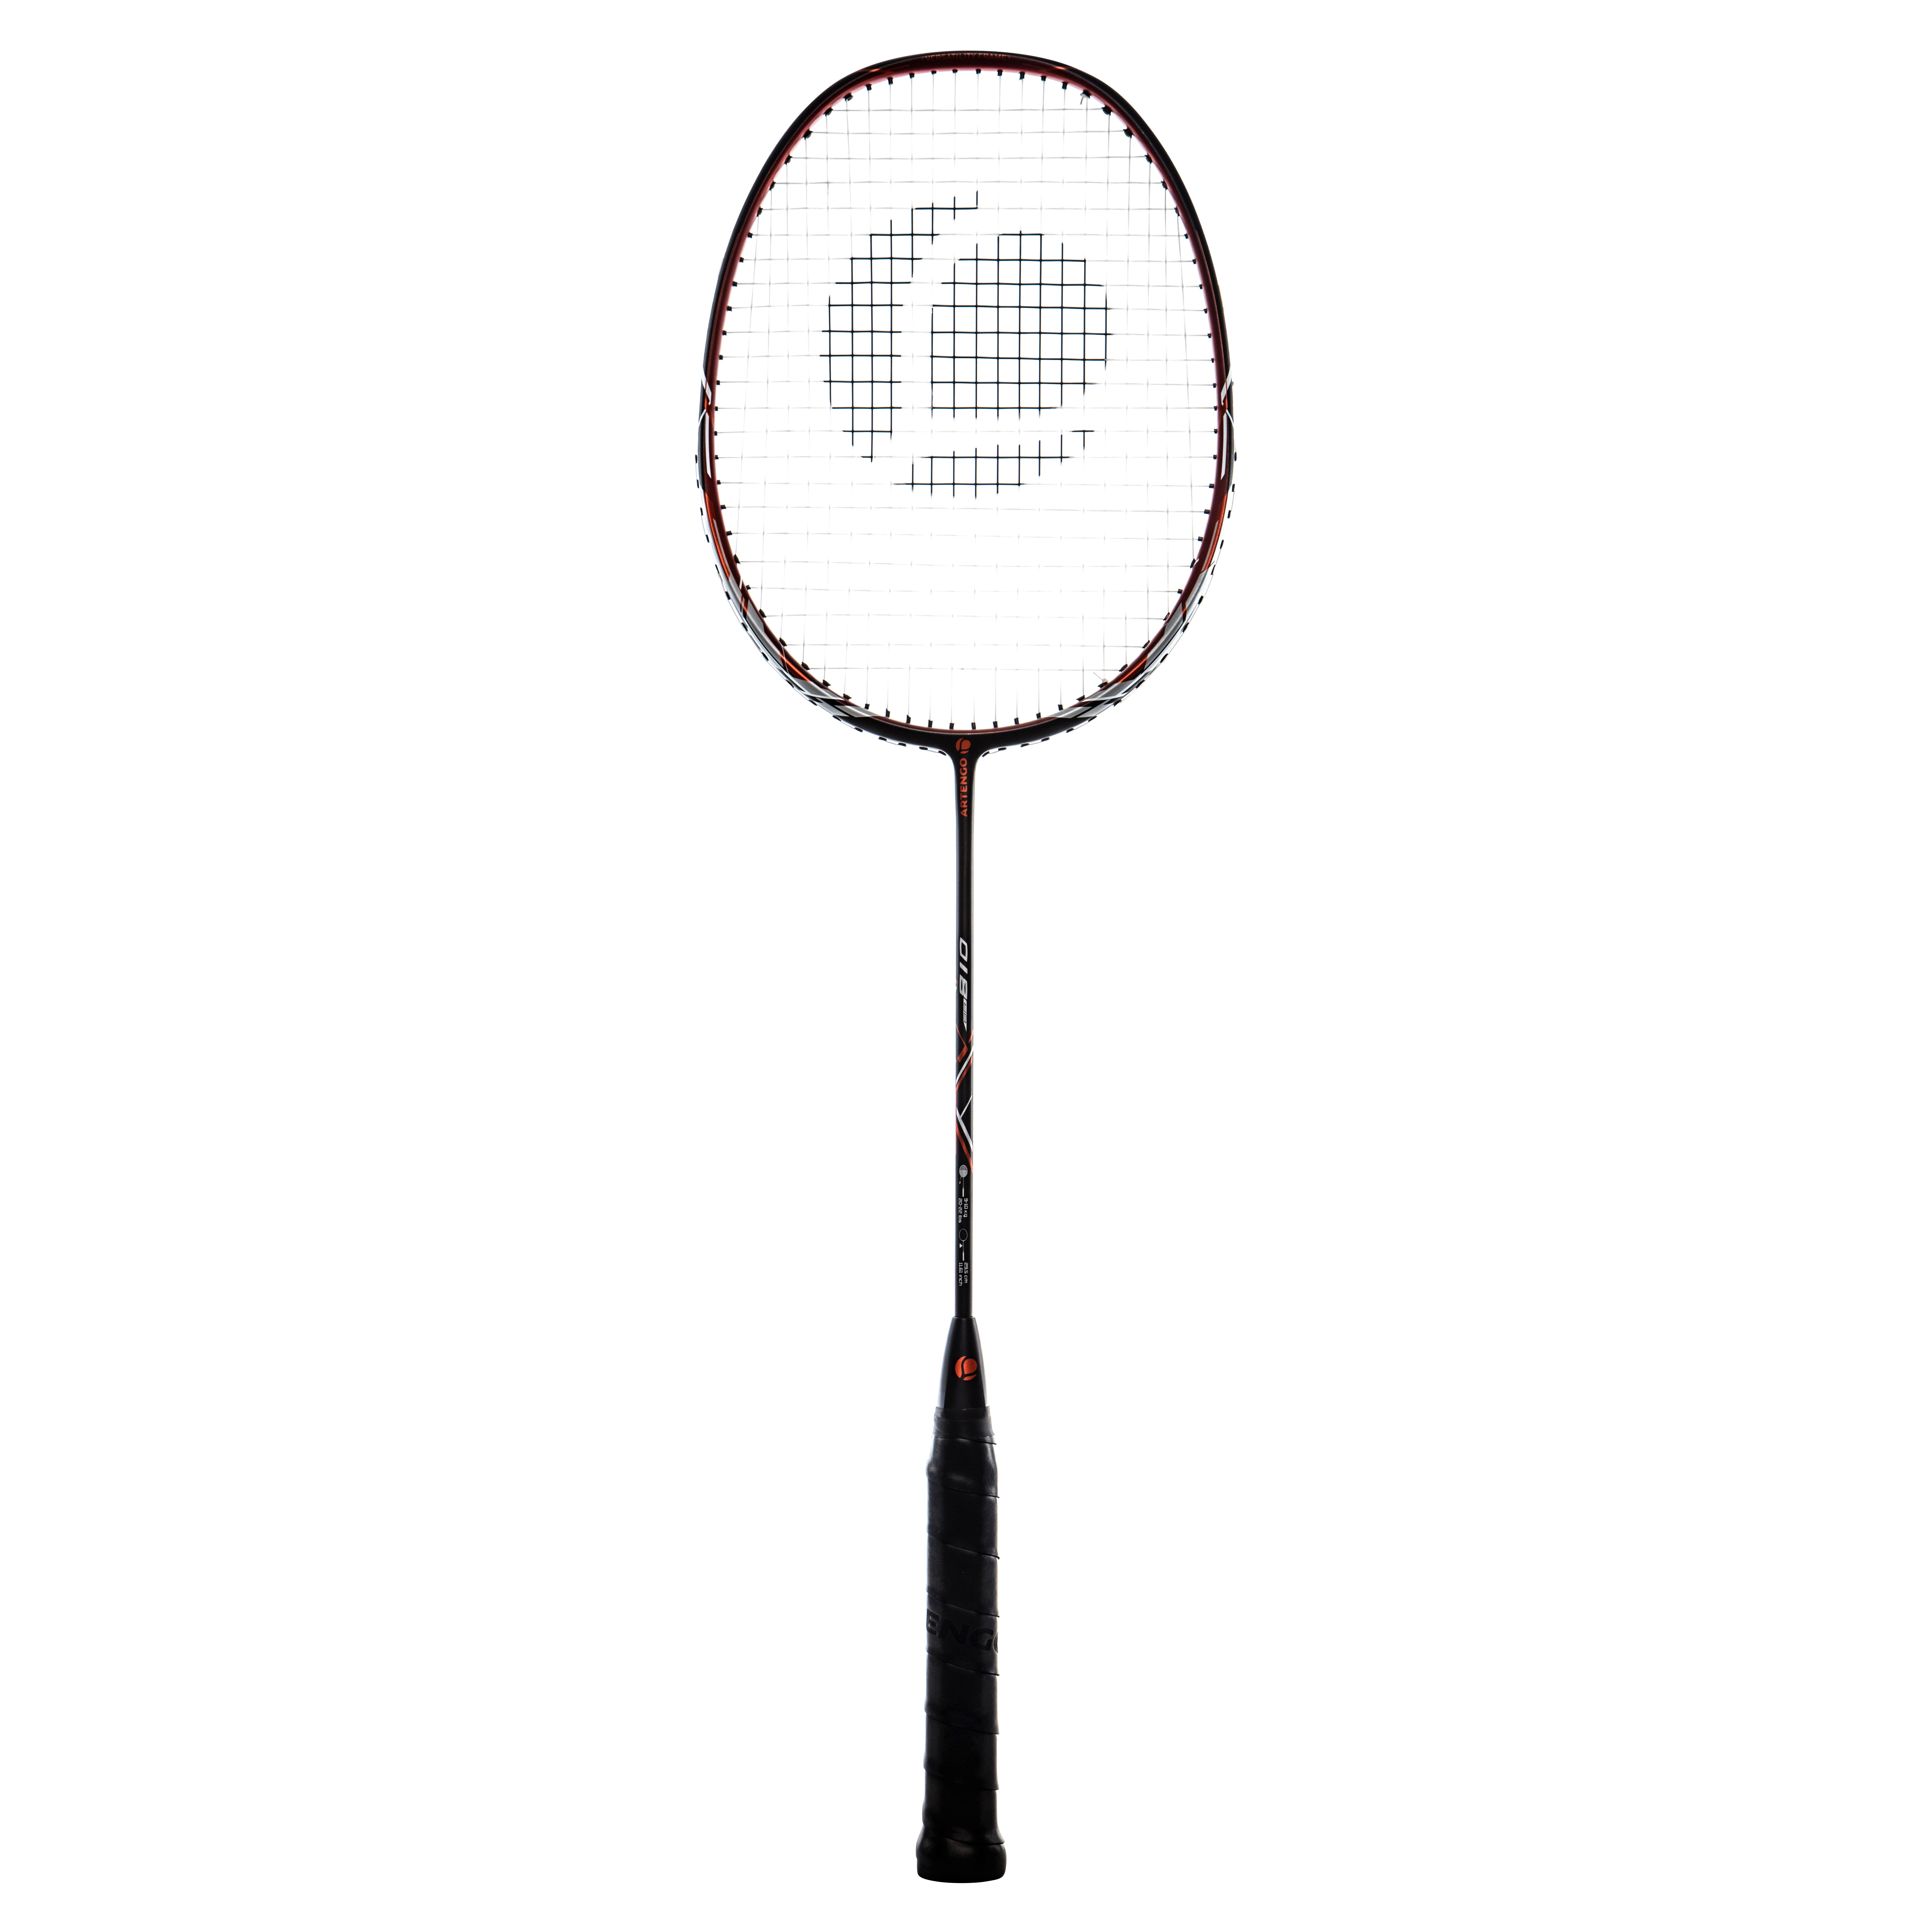 Artengo Badmintonracket BR810 - donkerrood